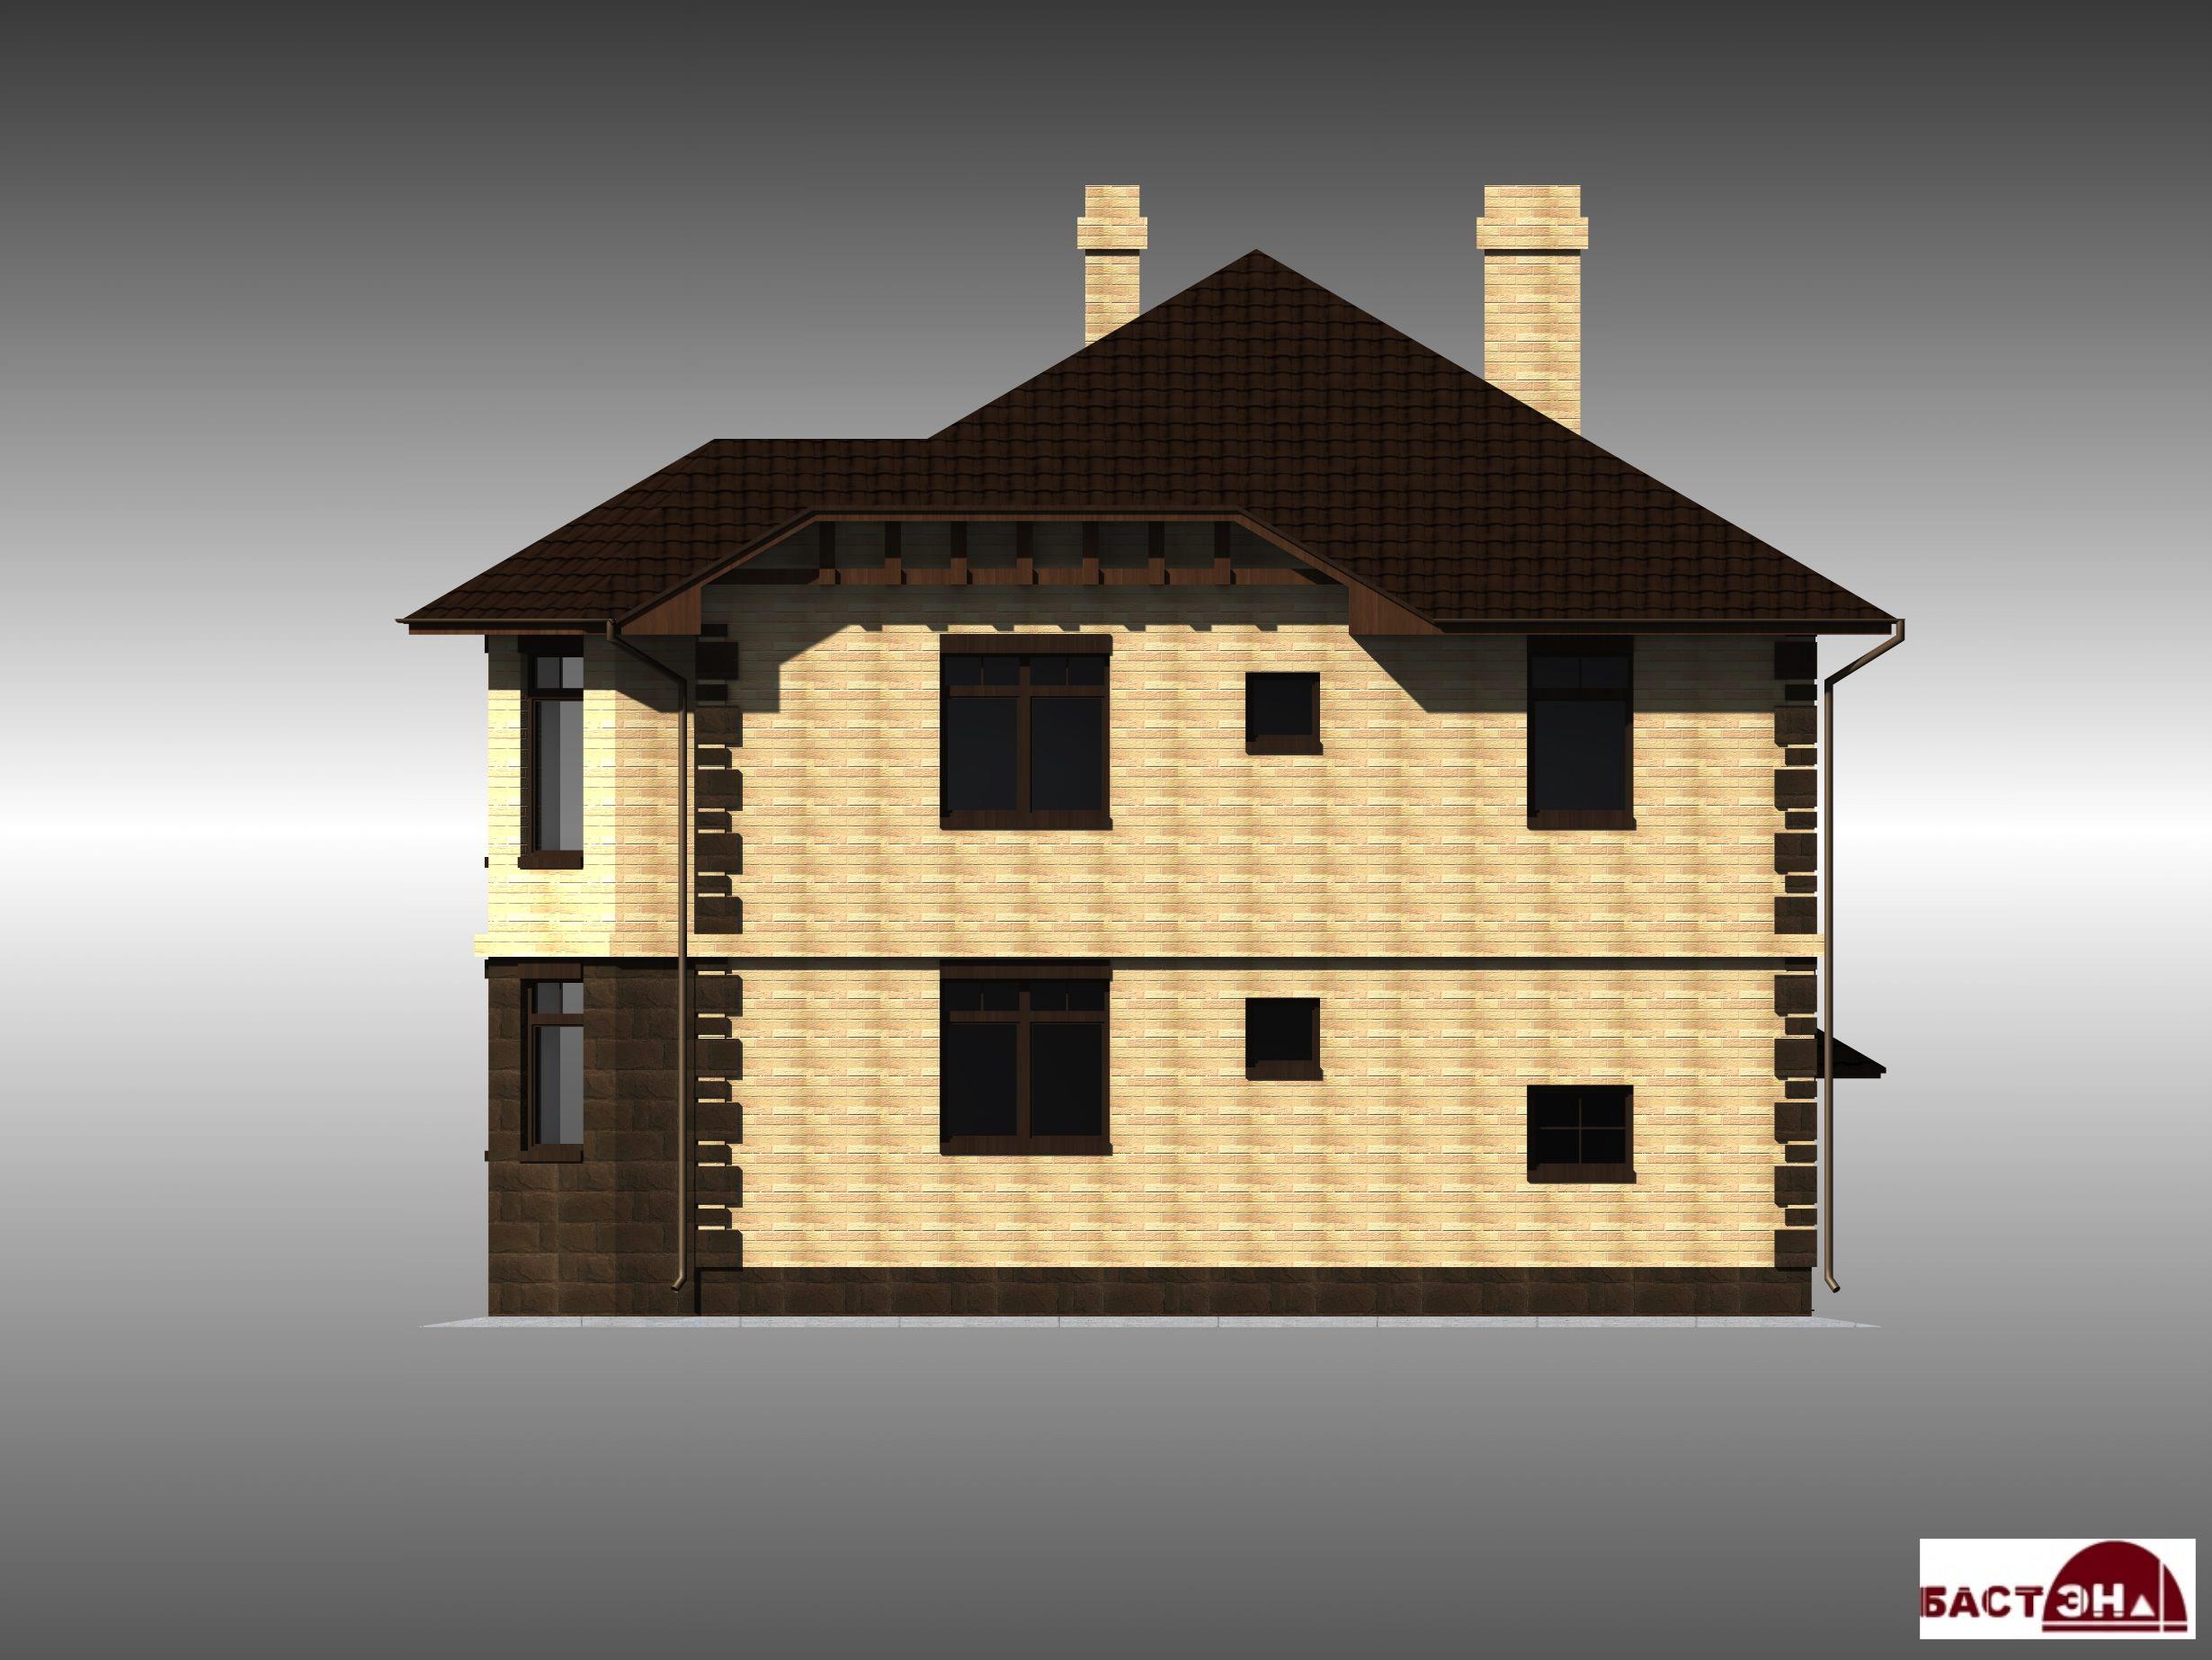 vid-2-individualnyj-dizajn-fasada-tipovogo-proekta-53-31.jpg